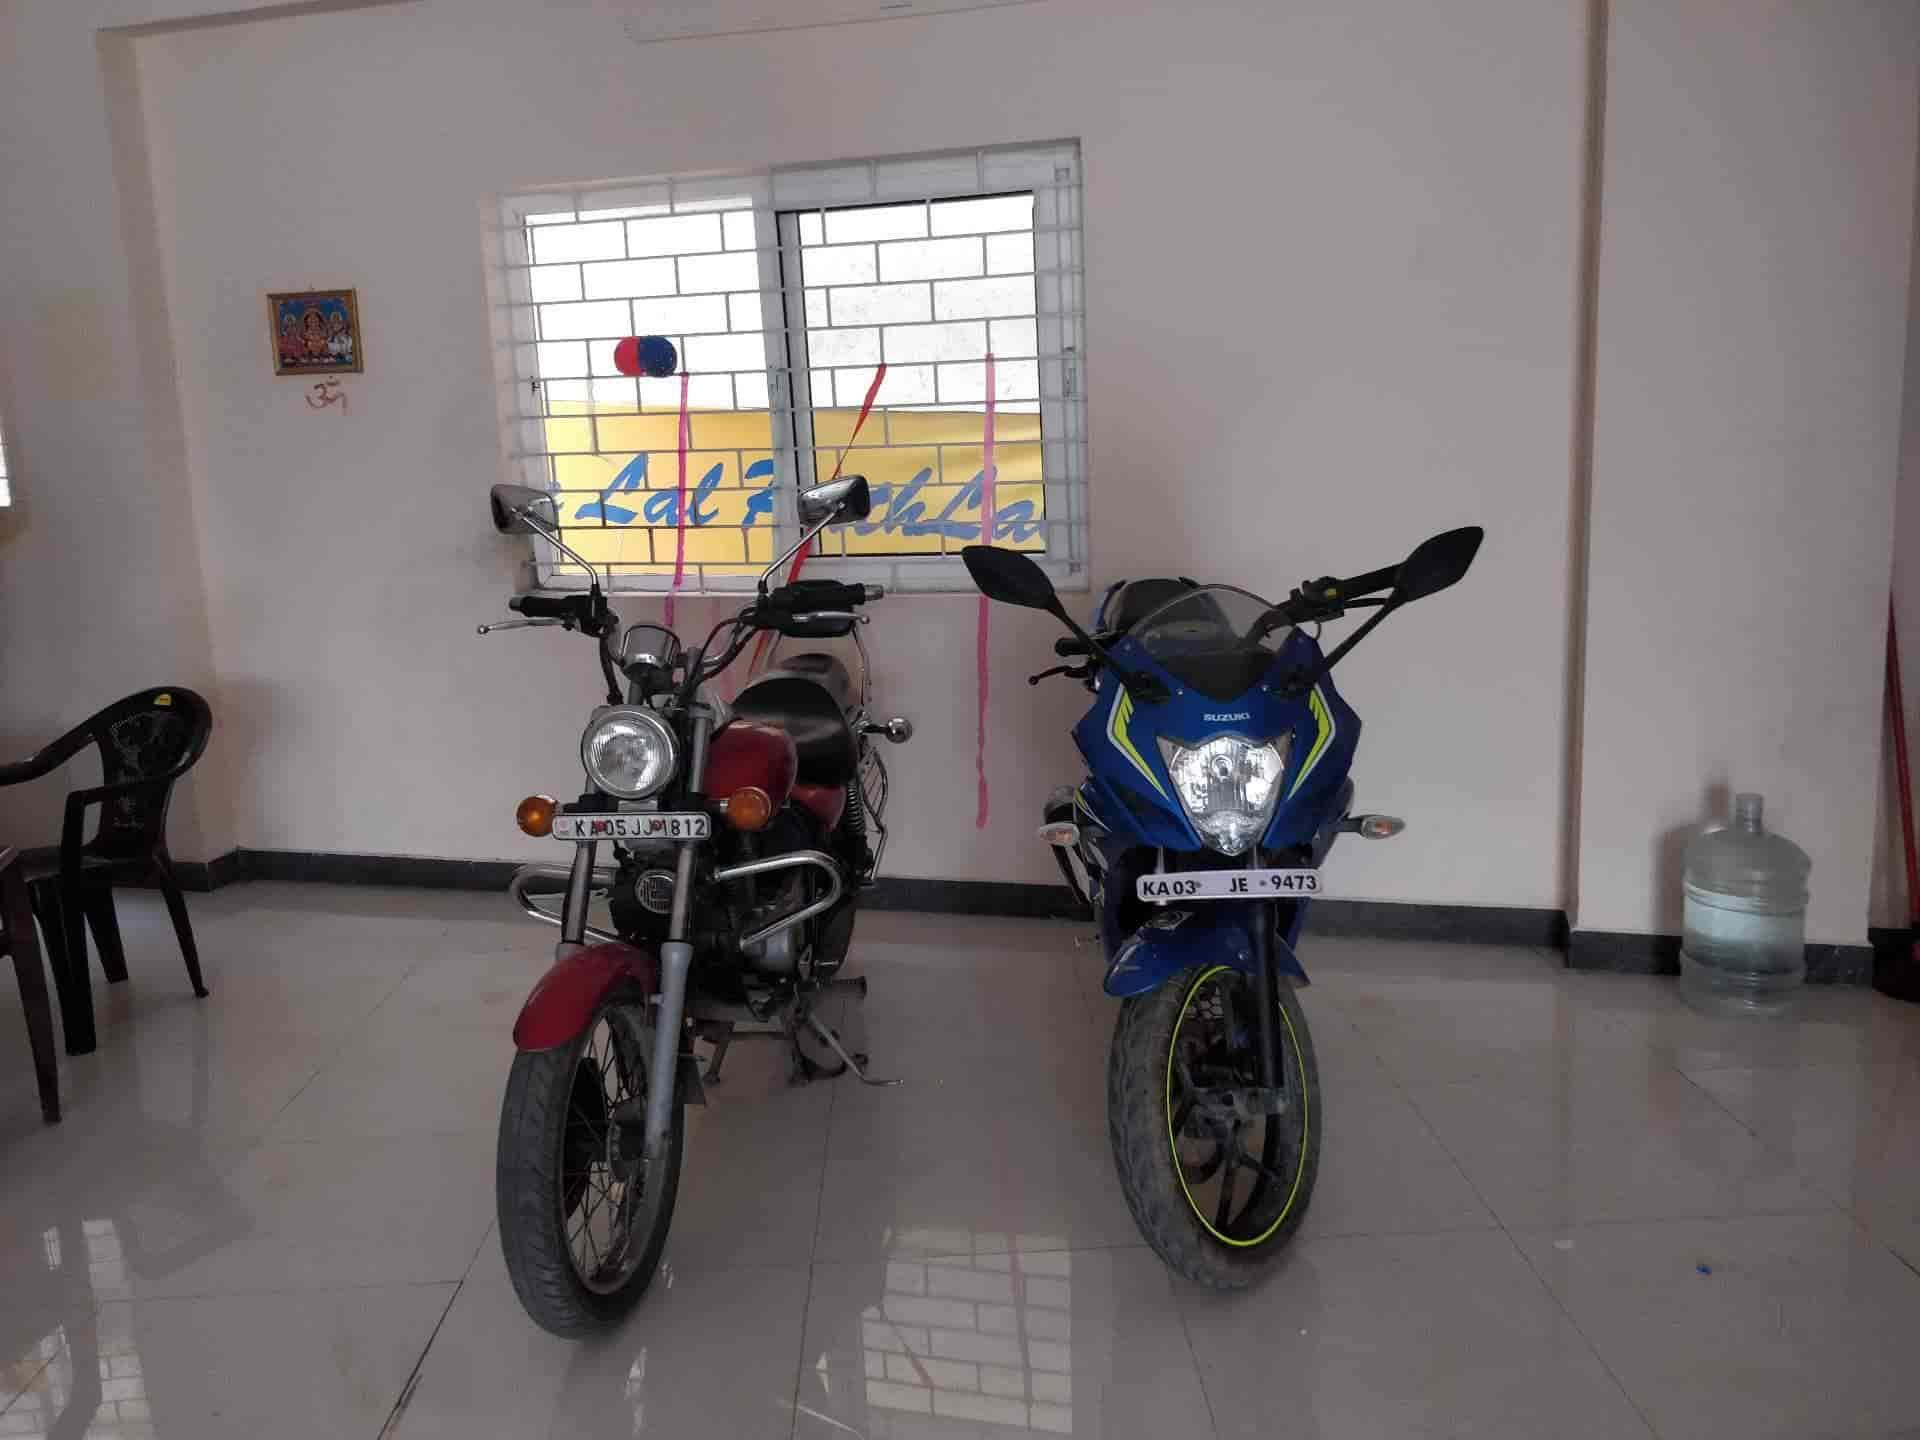 Quikr Bike Point Photos, Banaswadi, Bangalore- Pictures & Images